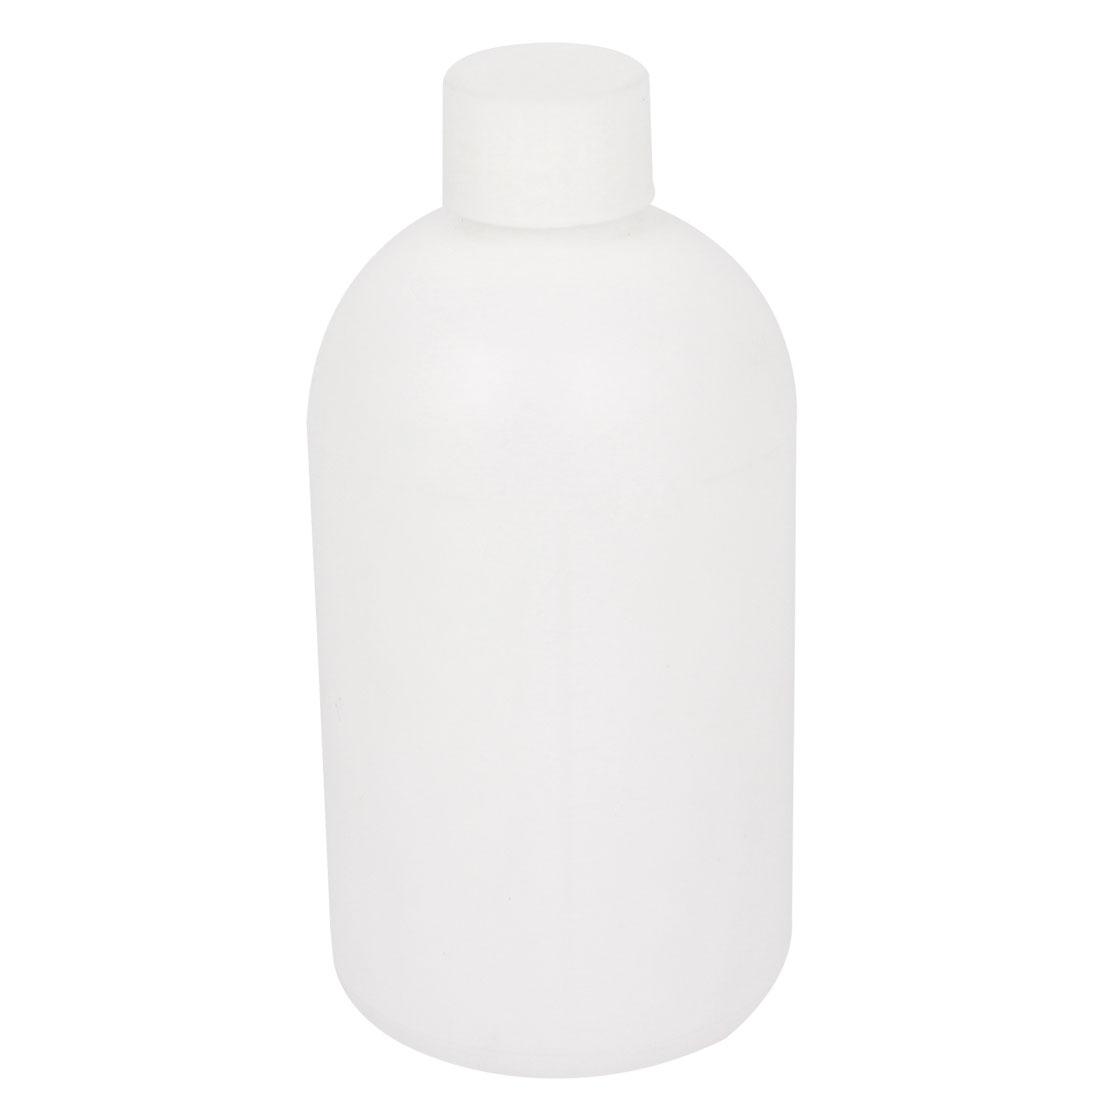 Graduated 500ml Plastic Bottle HDPE White Watertight Screw-Top Lid w Inner Cap